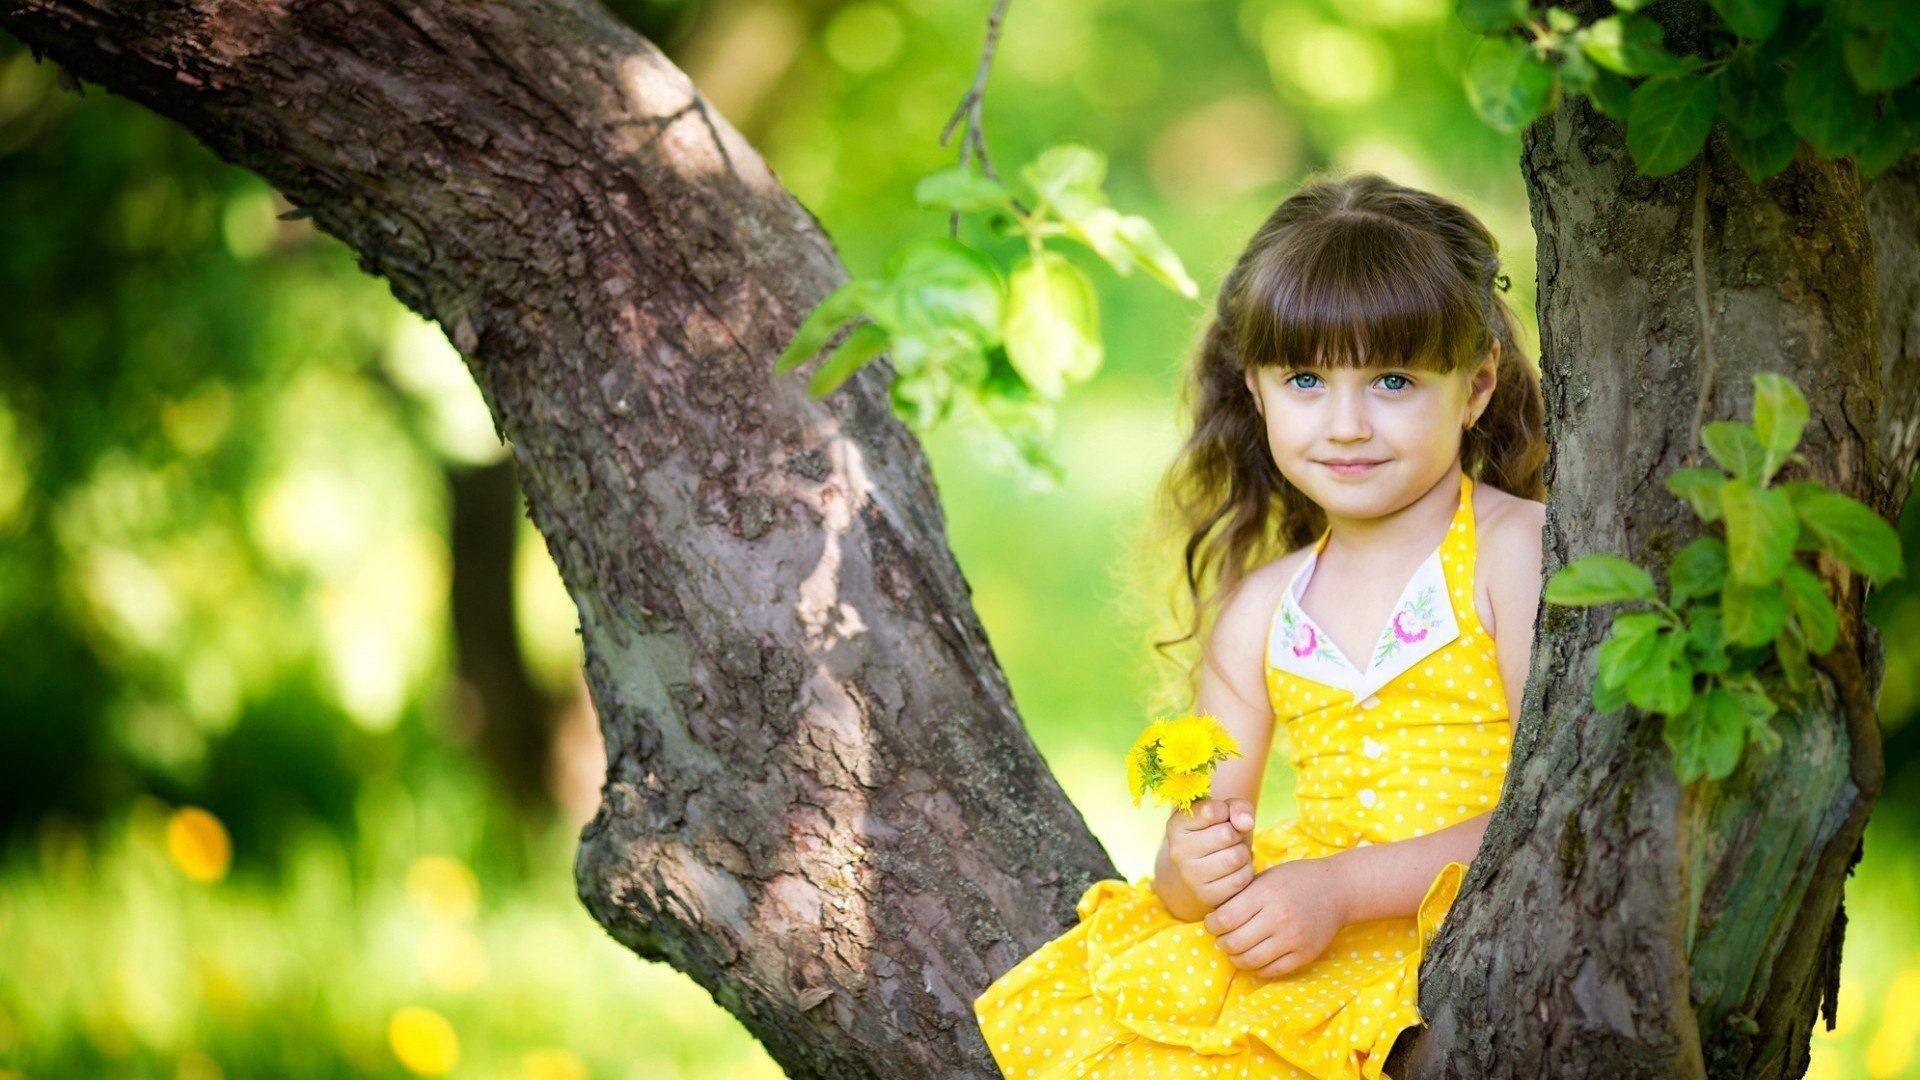 Image: Cute Baby Girl Nature Wallpaper